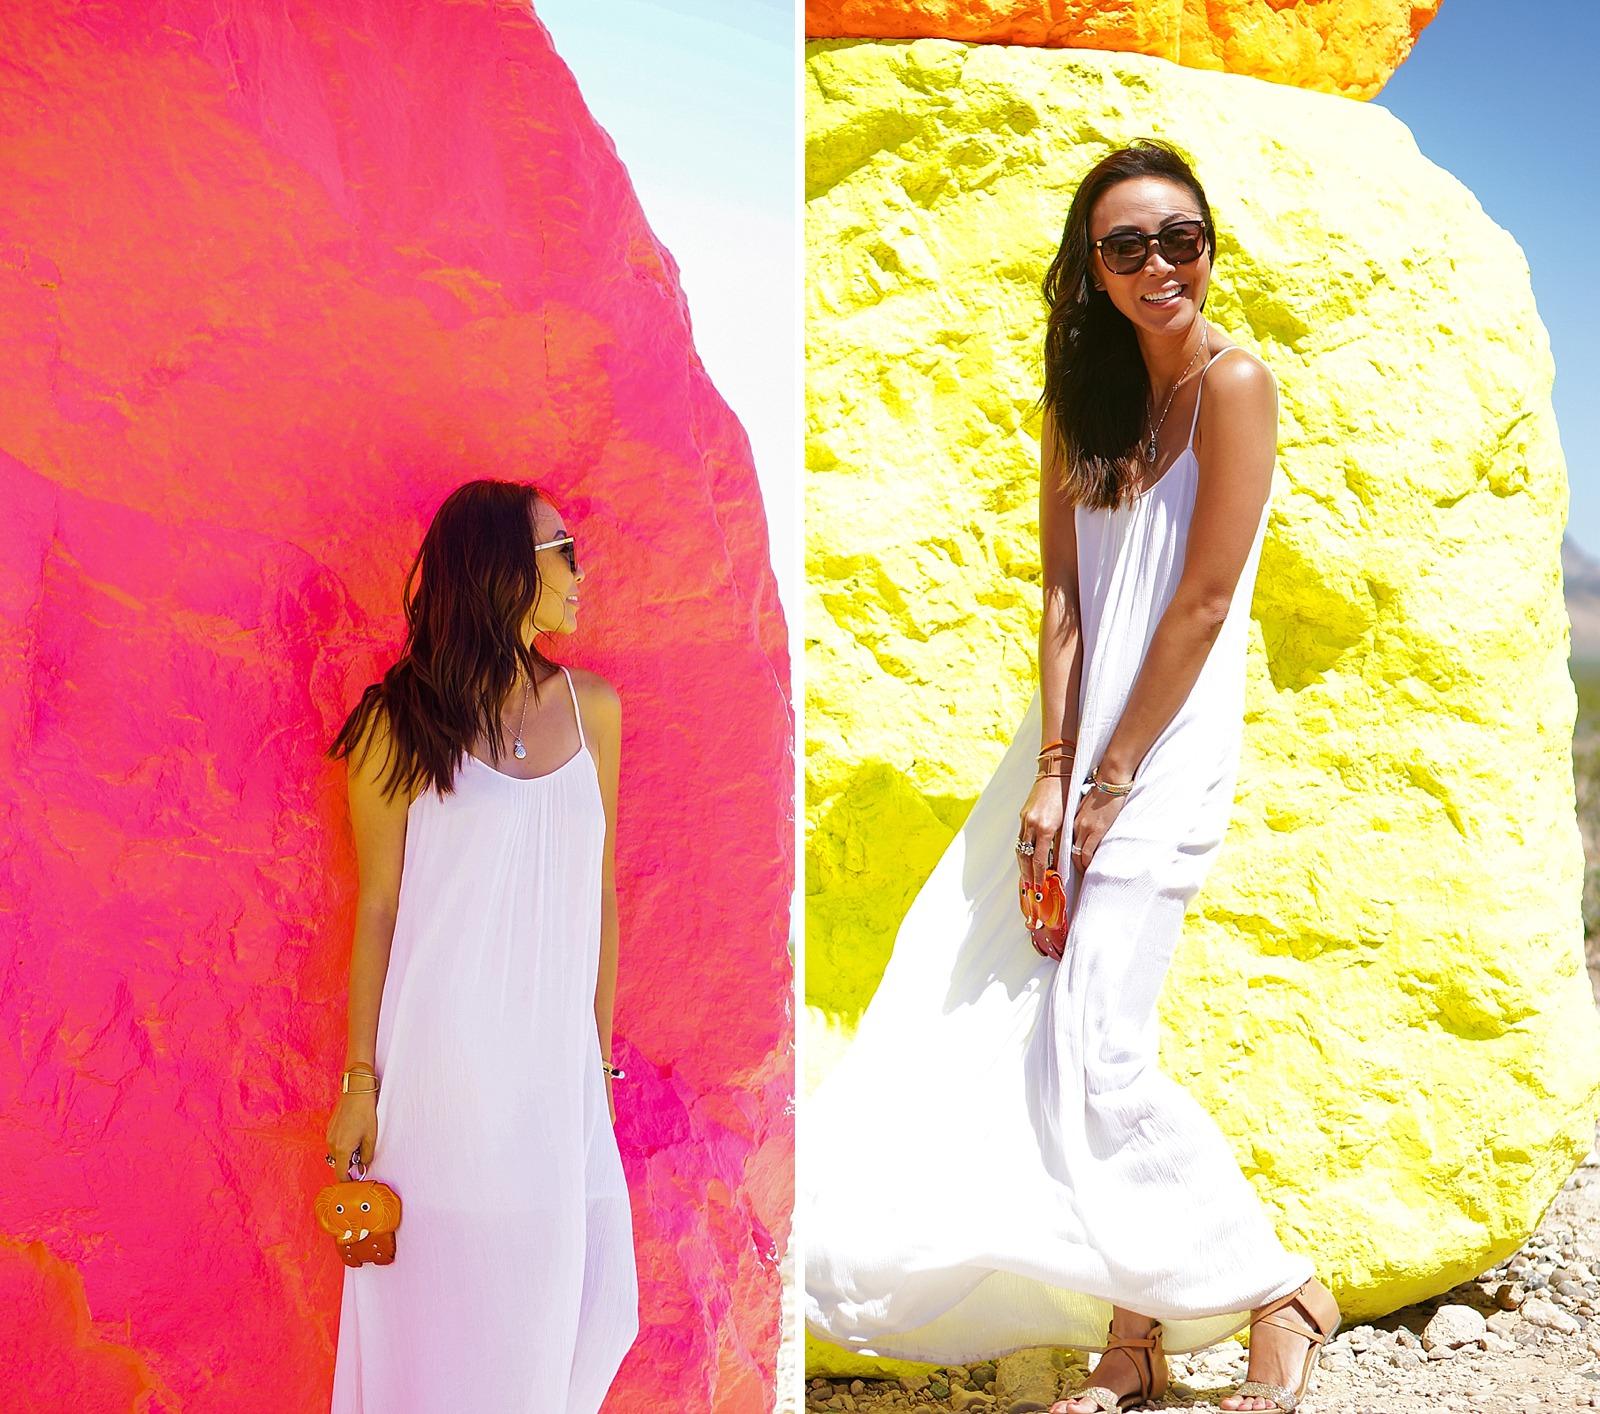 las-vegas-travel-blogger-trip-arizona-diana-elizabeth-blog-com-seven-magic-mountains-_0013